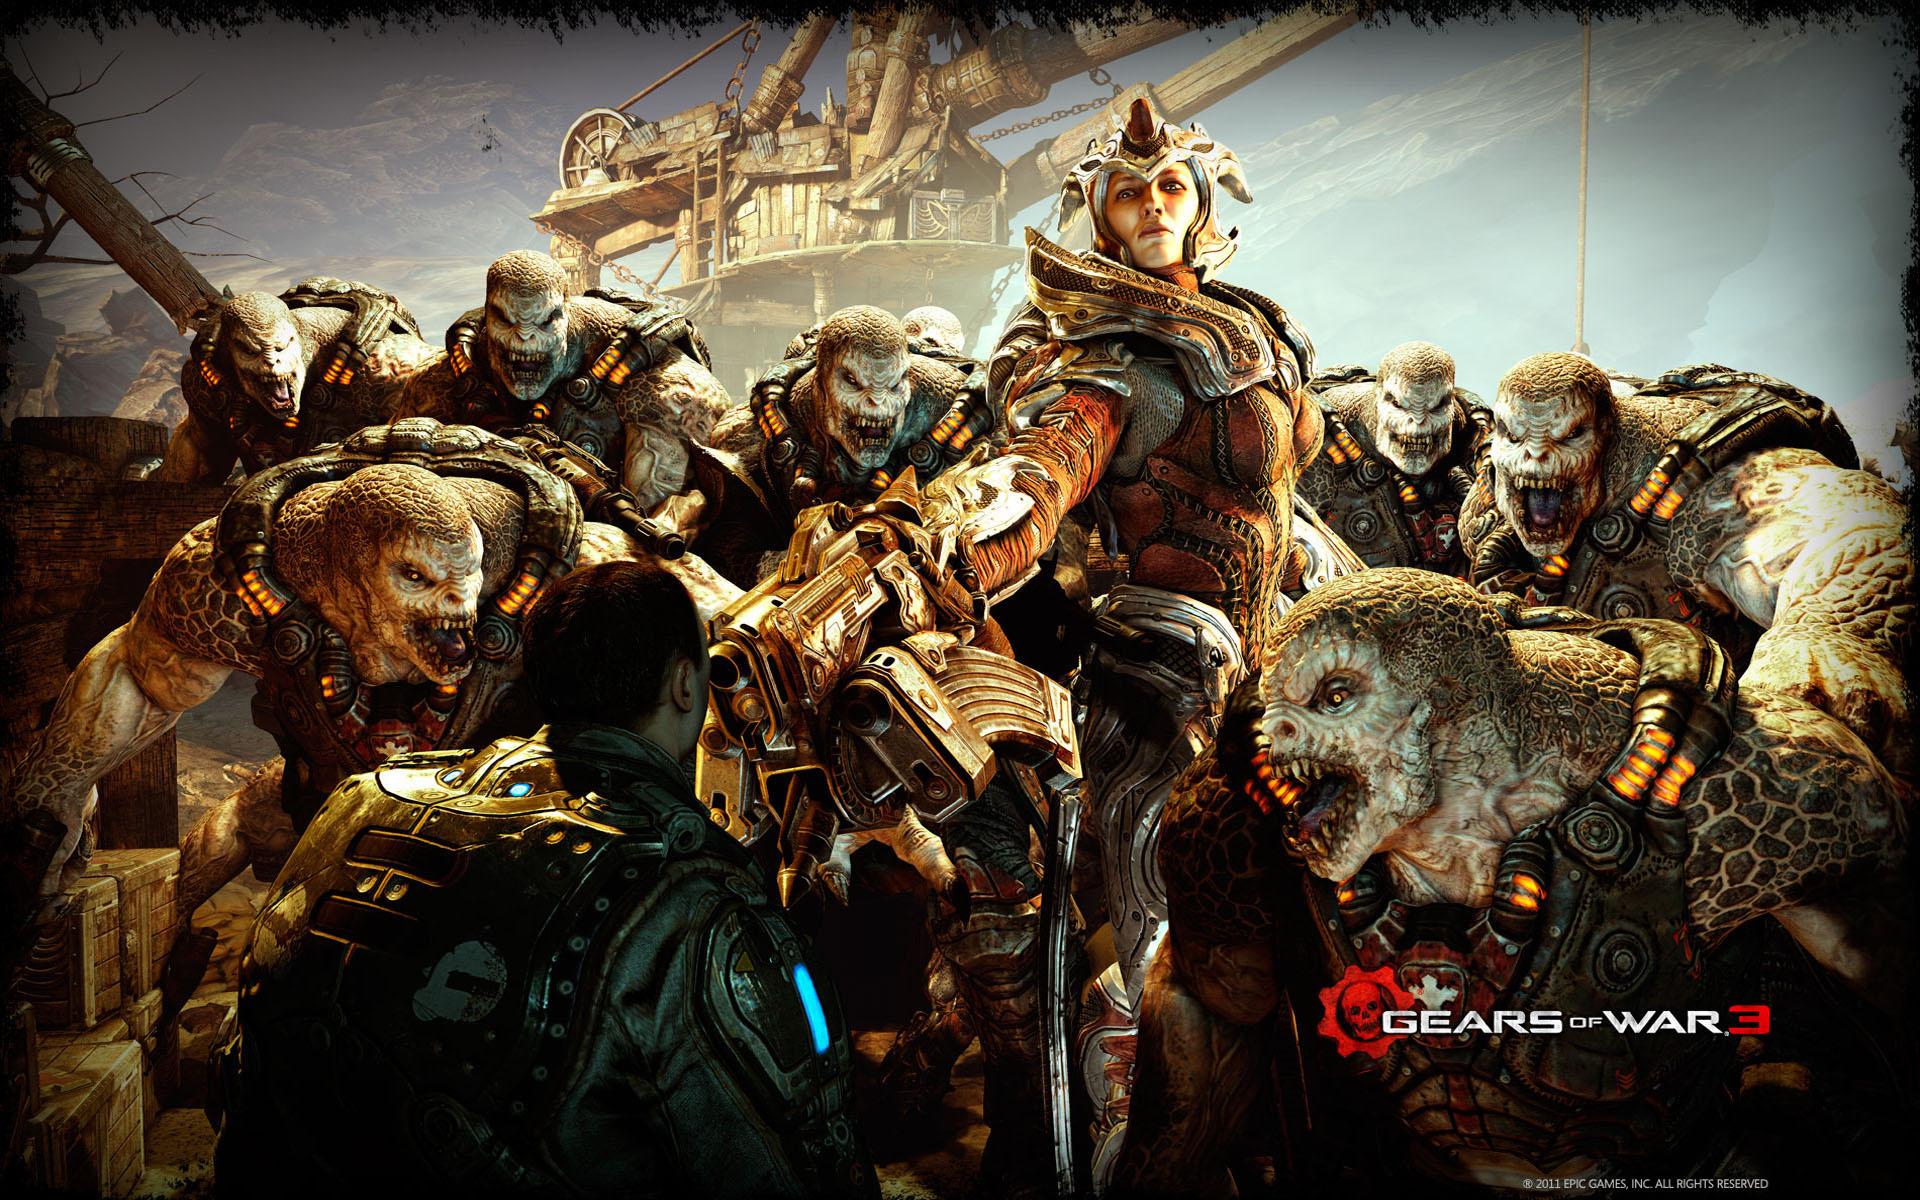 Gears Of War 3 2011 Wallpapers HD 1920x1200